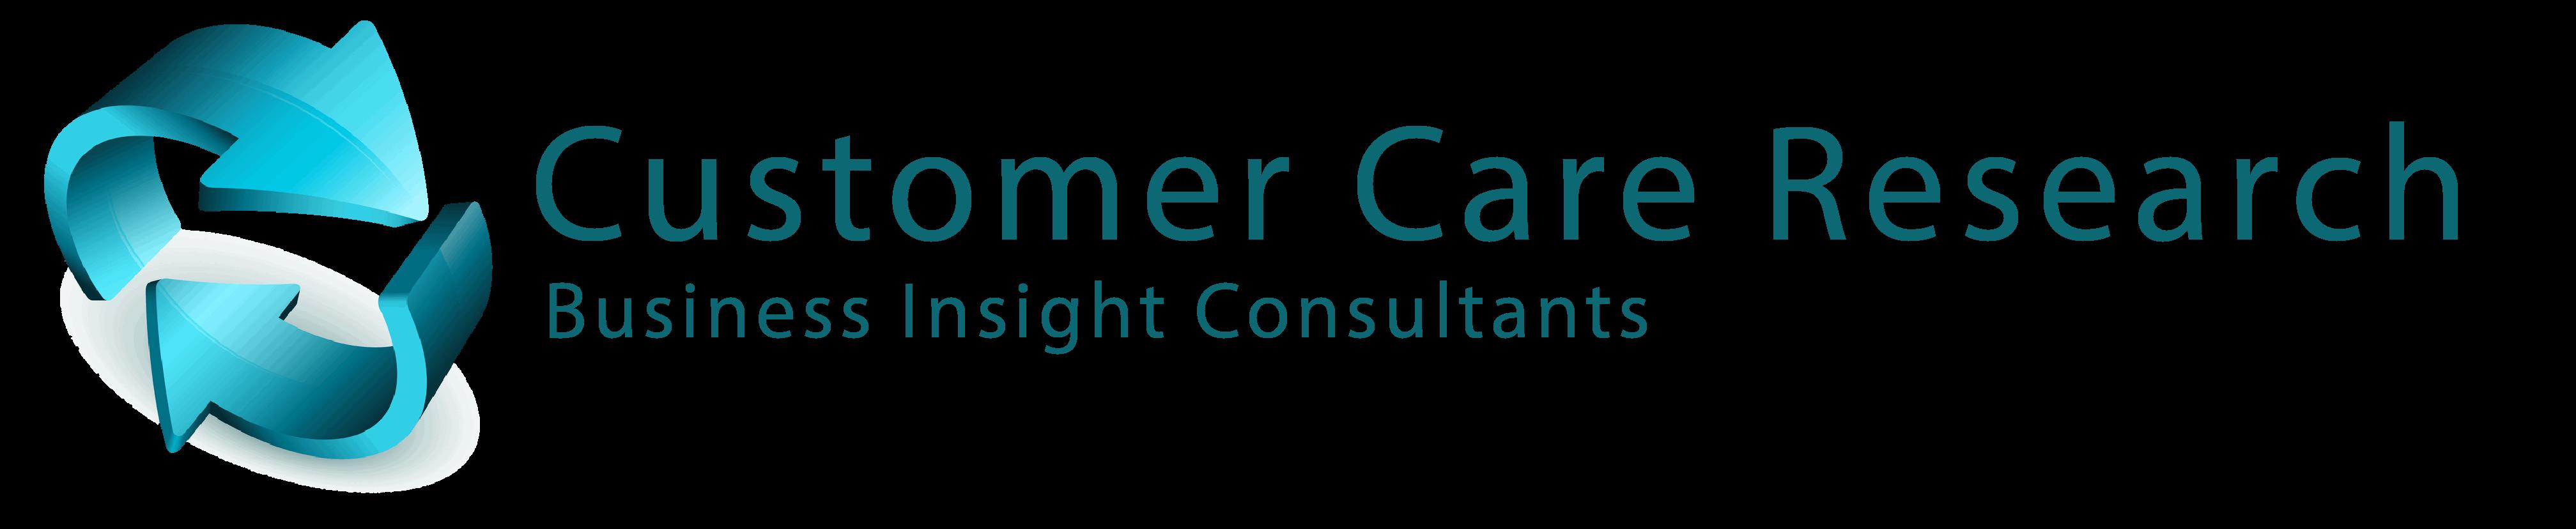 Customer Care Research Company Logo